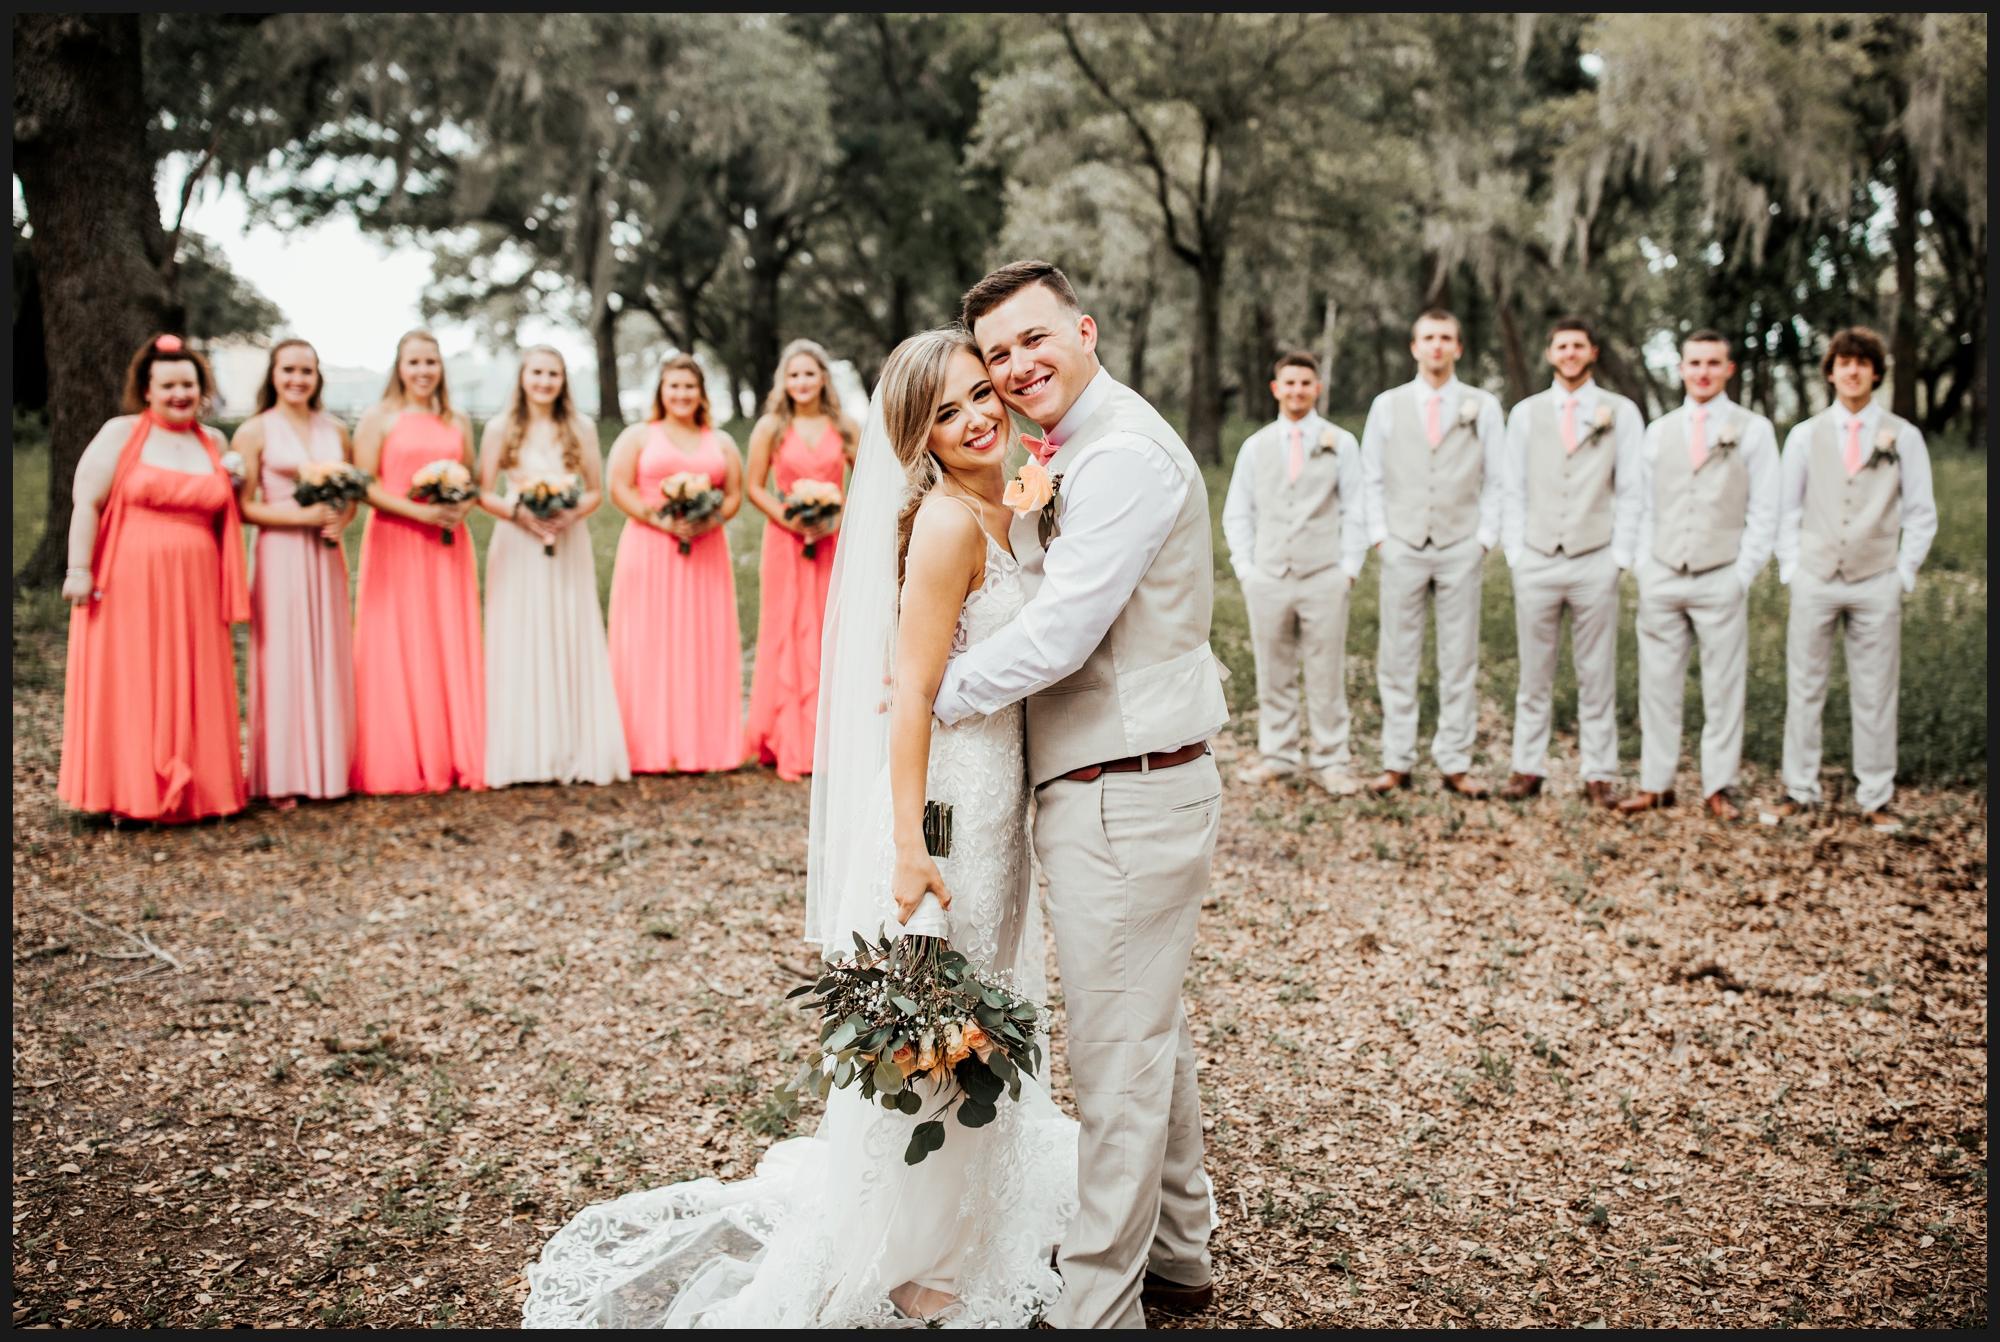 Orlando-Wedding-Photographer-destination-wedding-photographer-florida-wedding-photographer-hawaii-wedding-photographer_0301.jpg